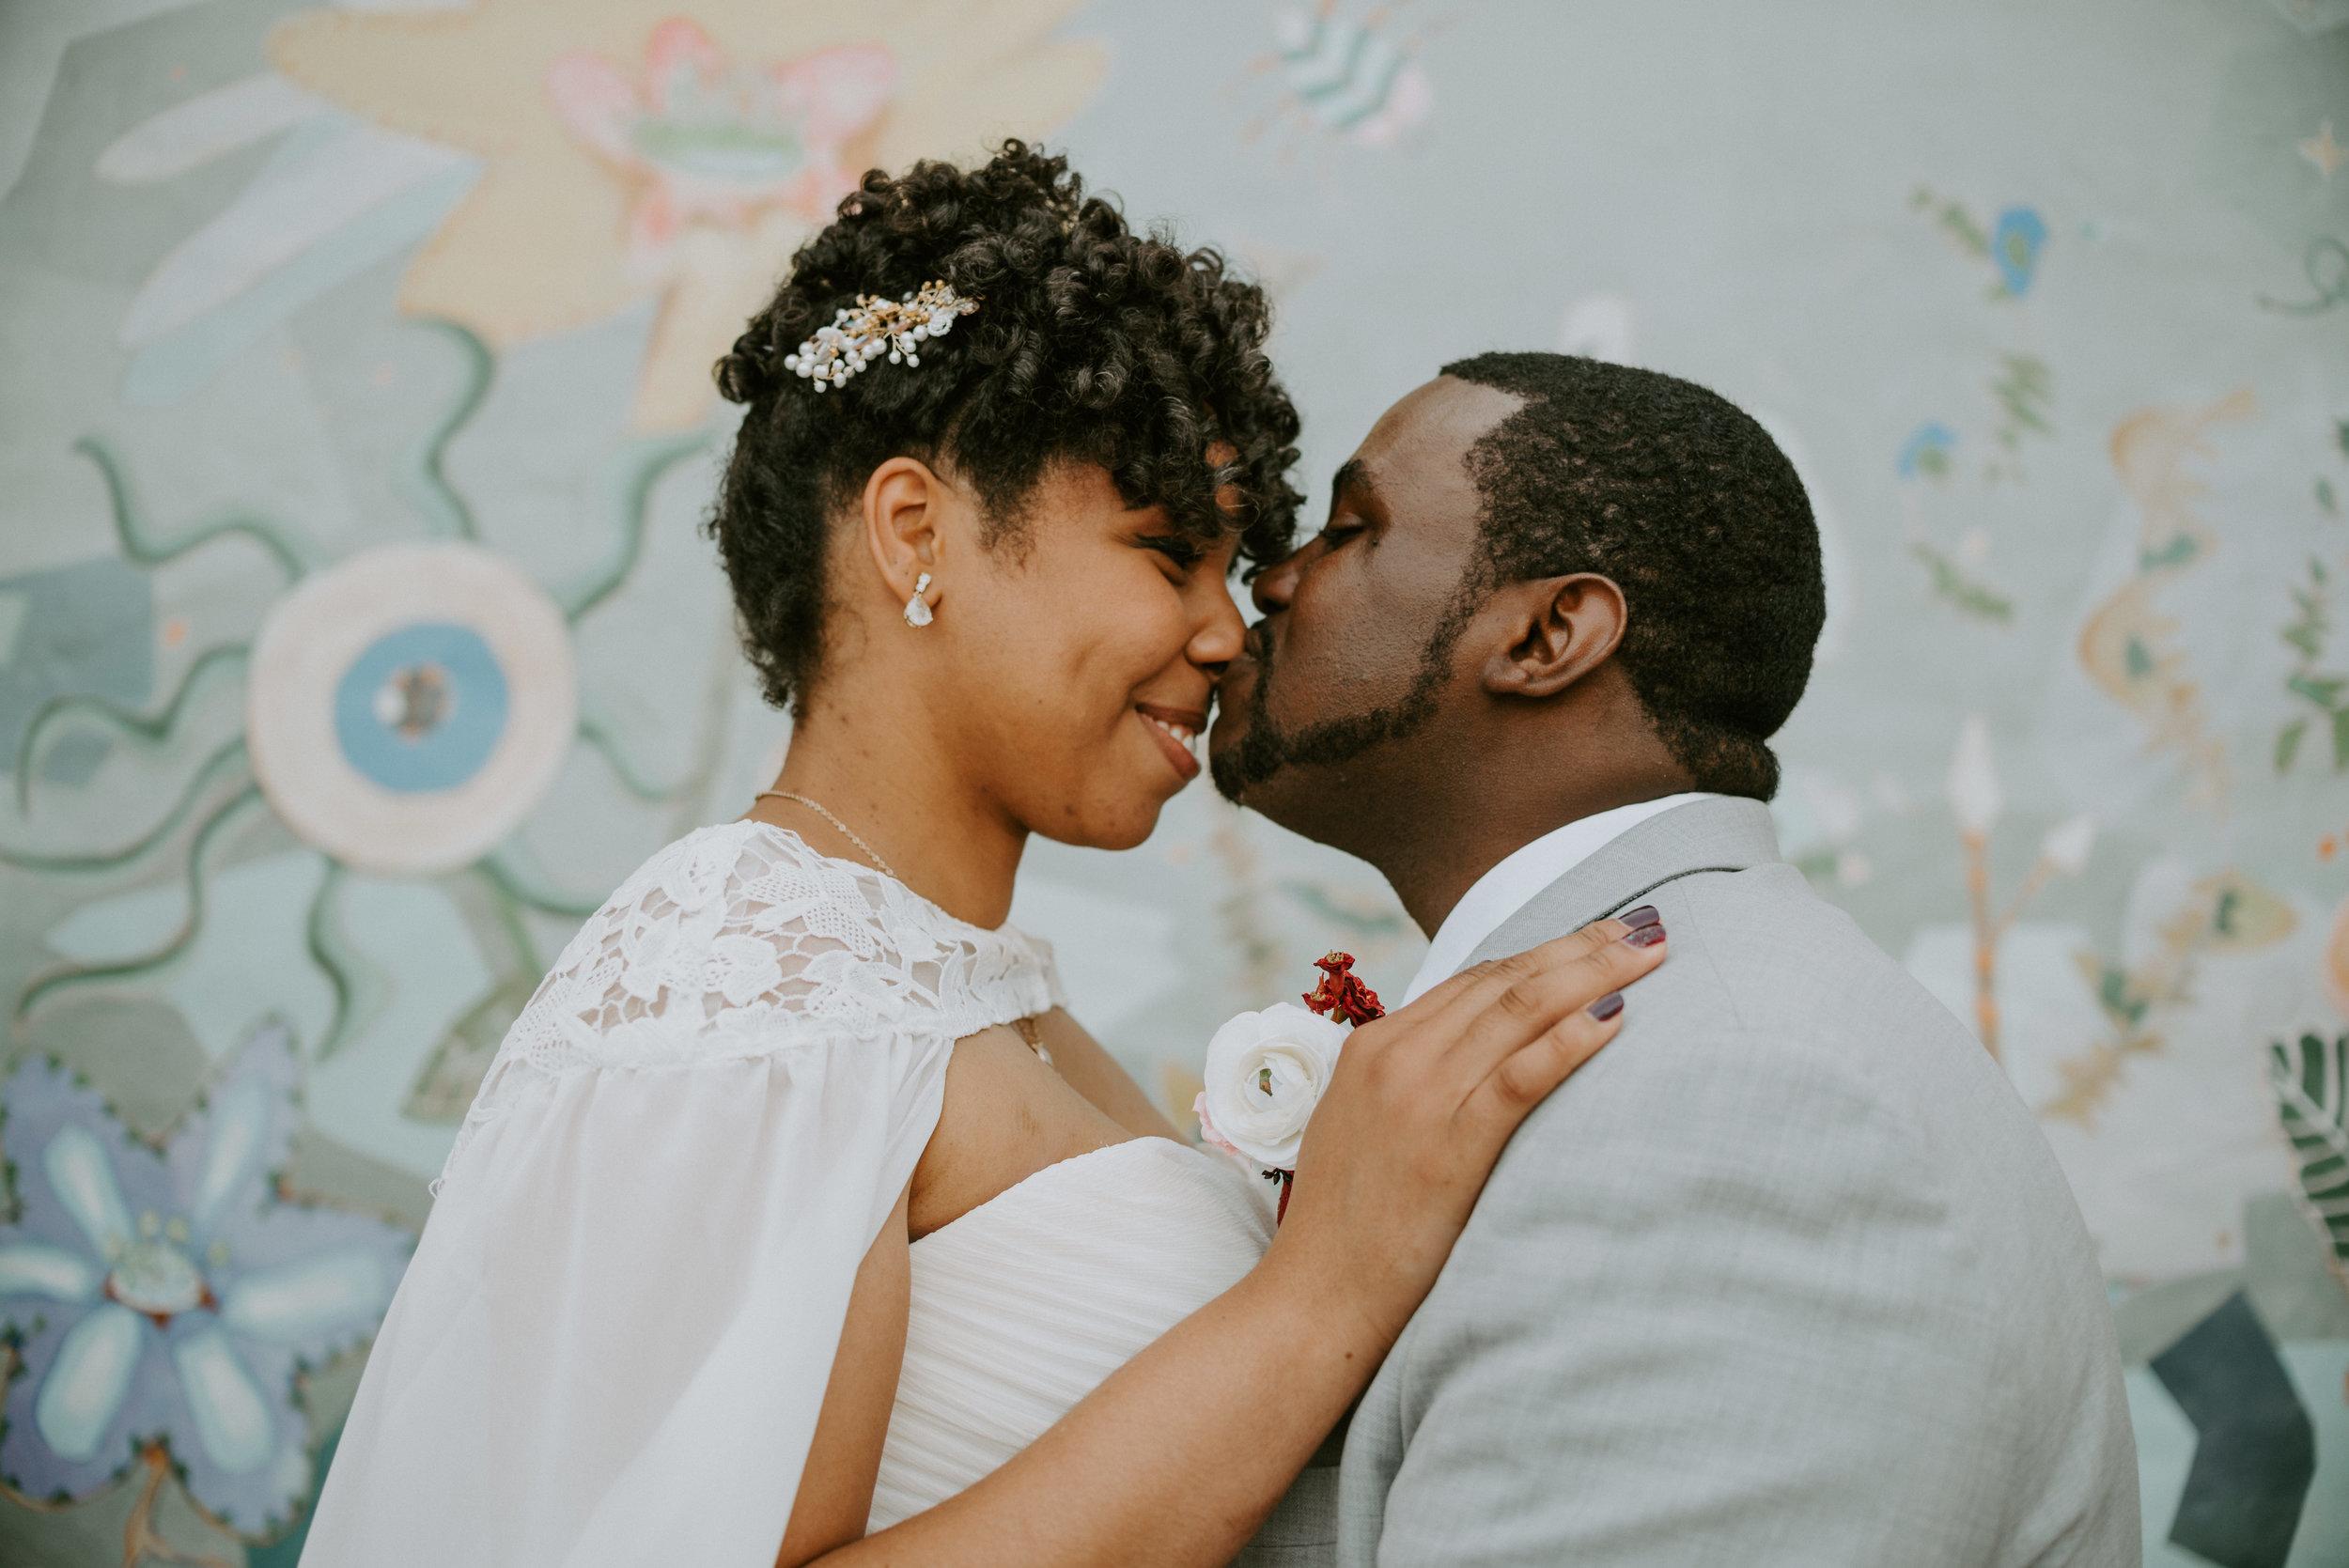 WonderlyCreative_Wedding_6.7.18_Khara&Dwayne_-737.jpg